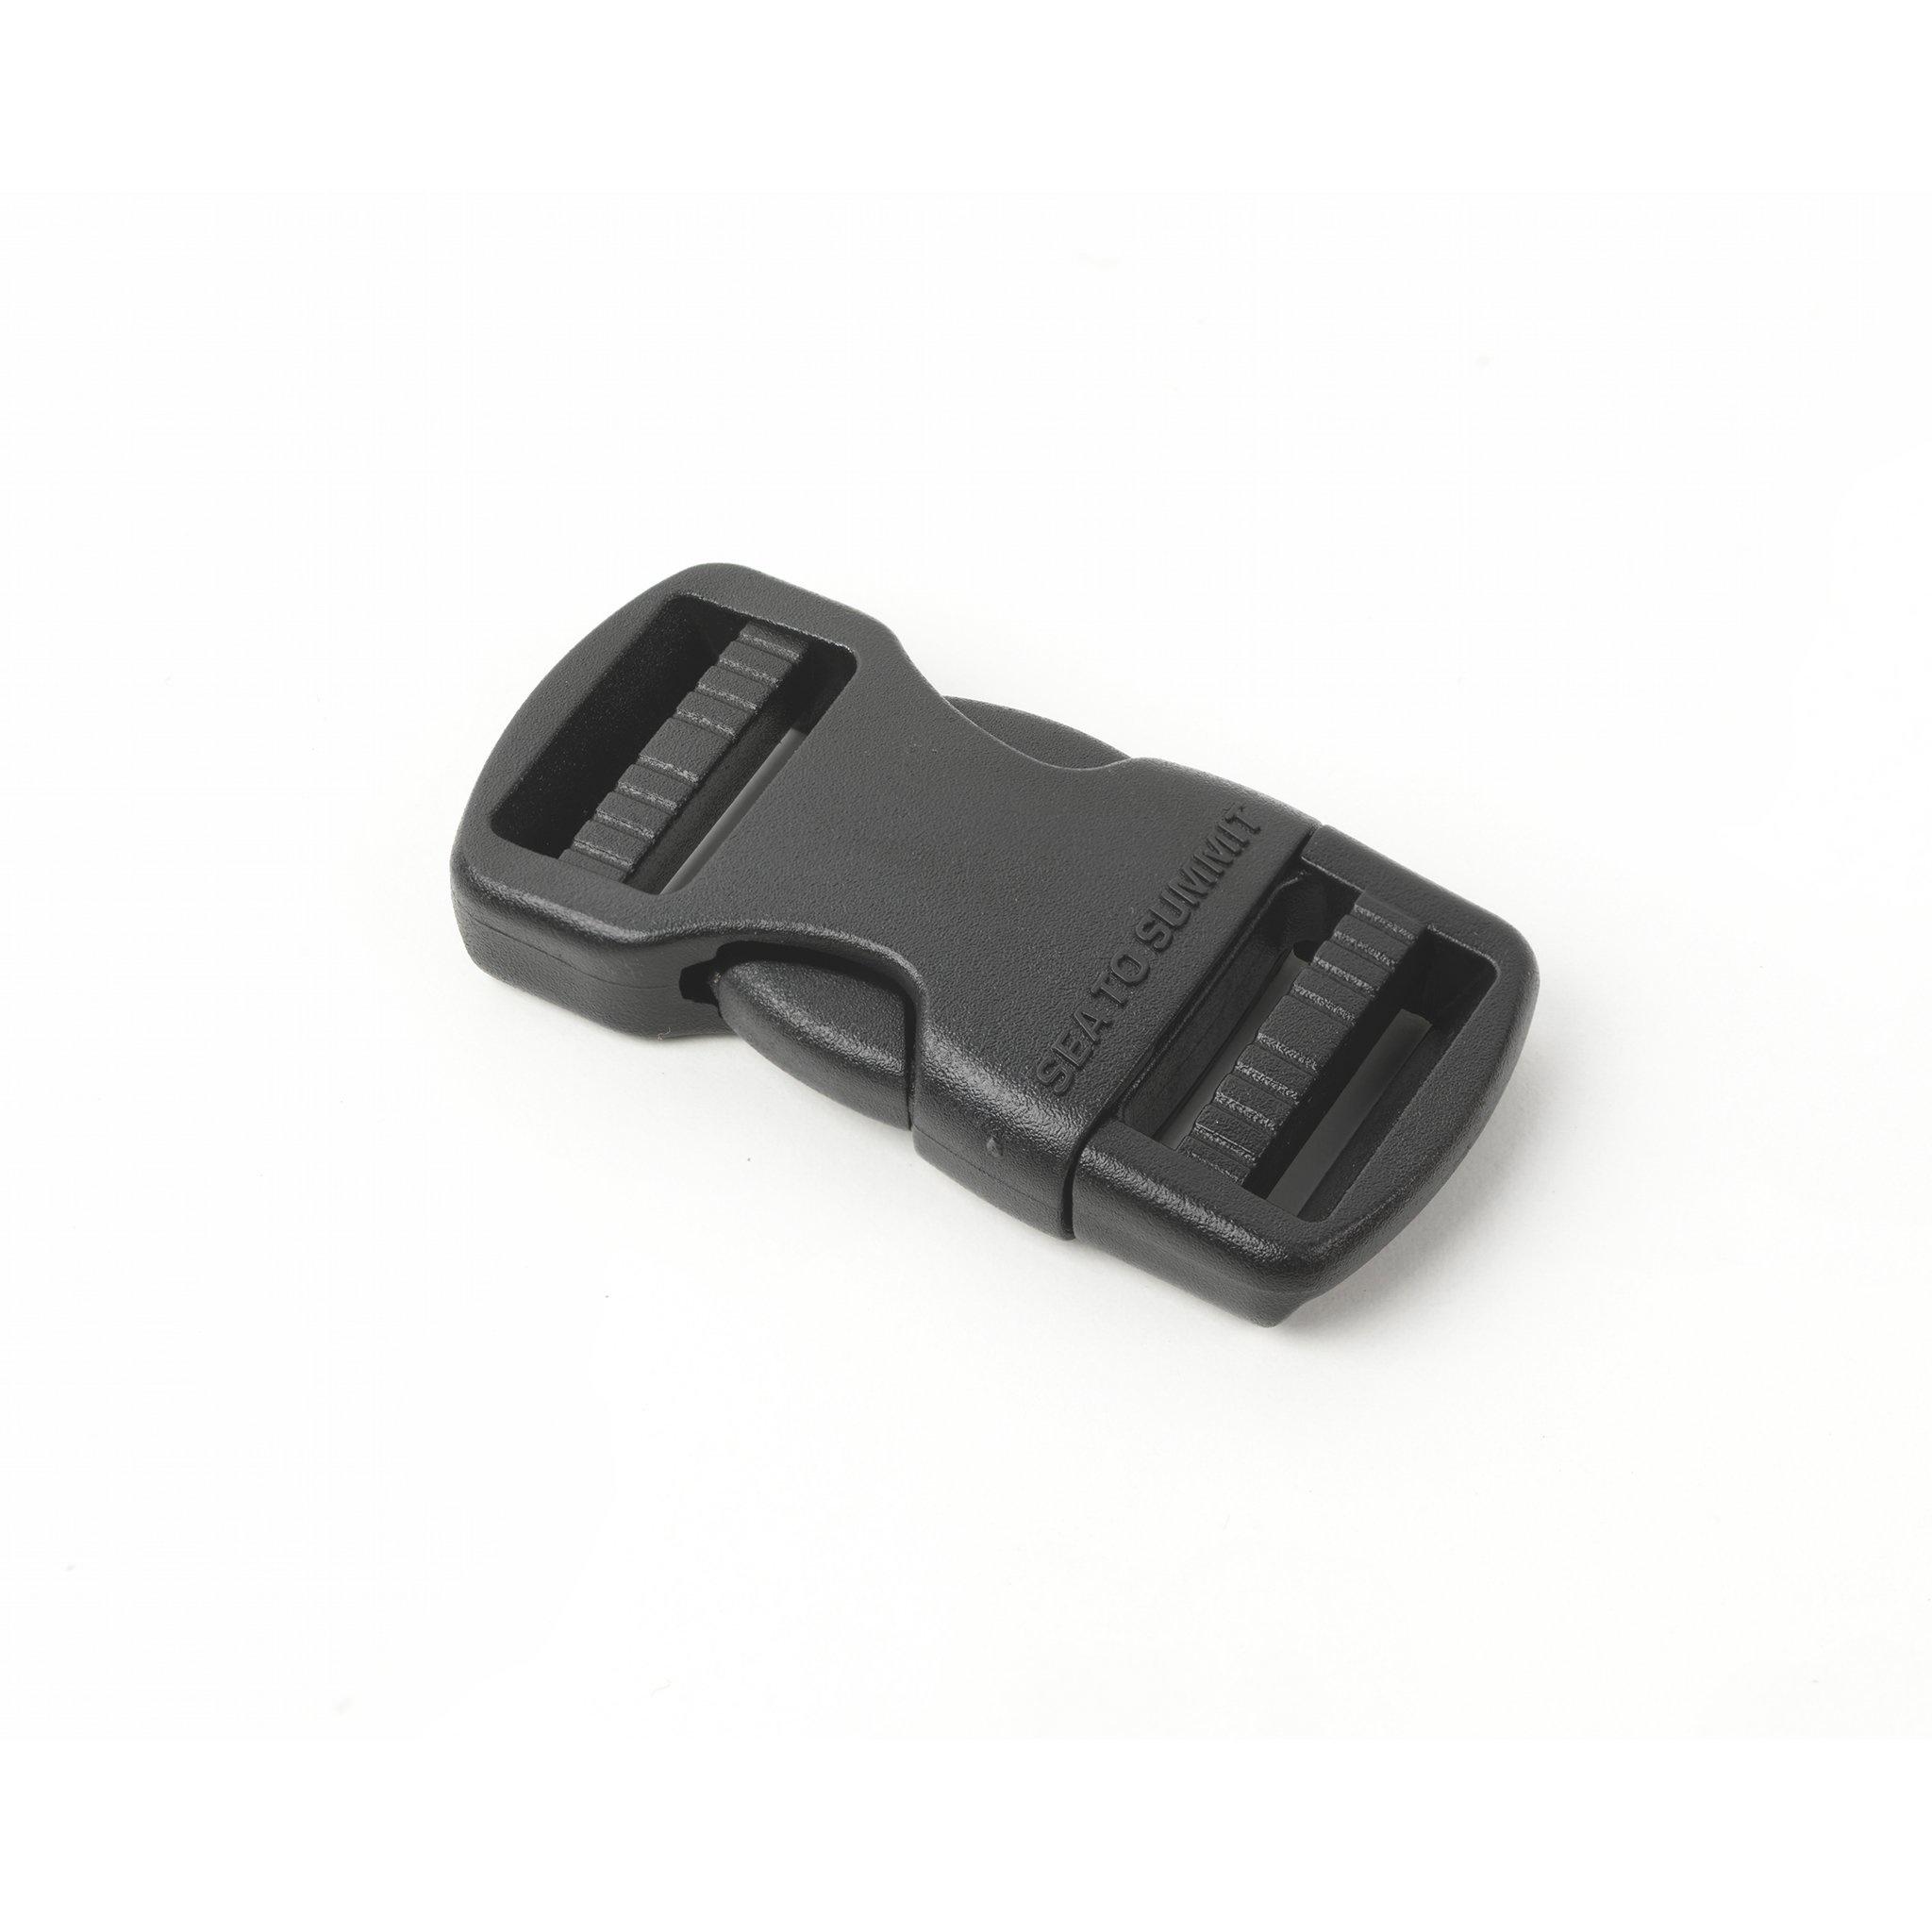 "Field Repair Buckle 20mm / 3/4"" Side Release 2 Ladderlock-1"